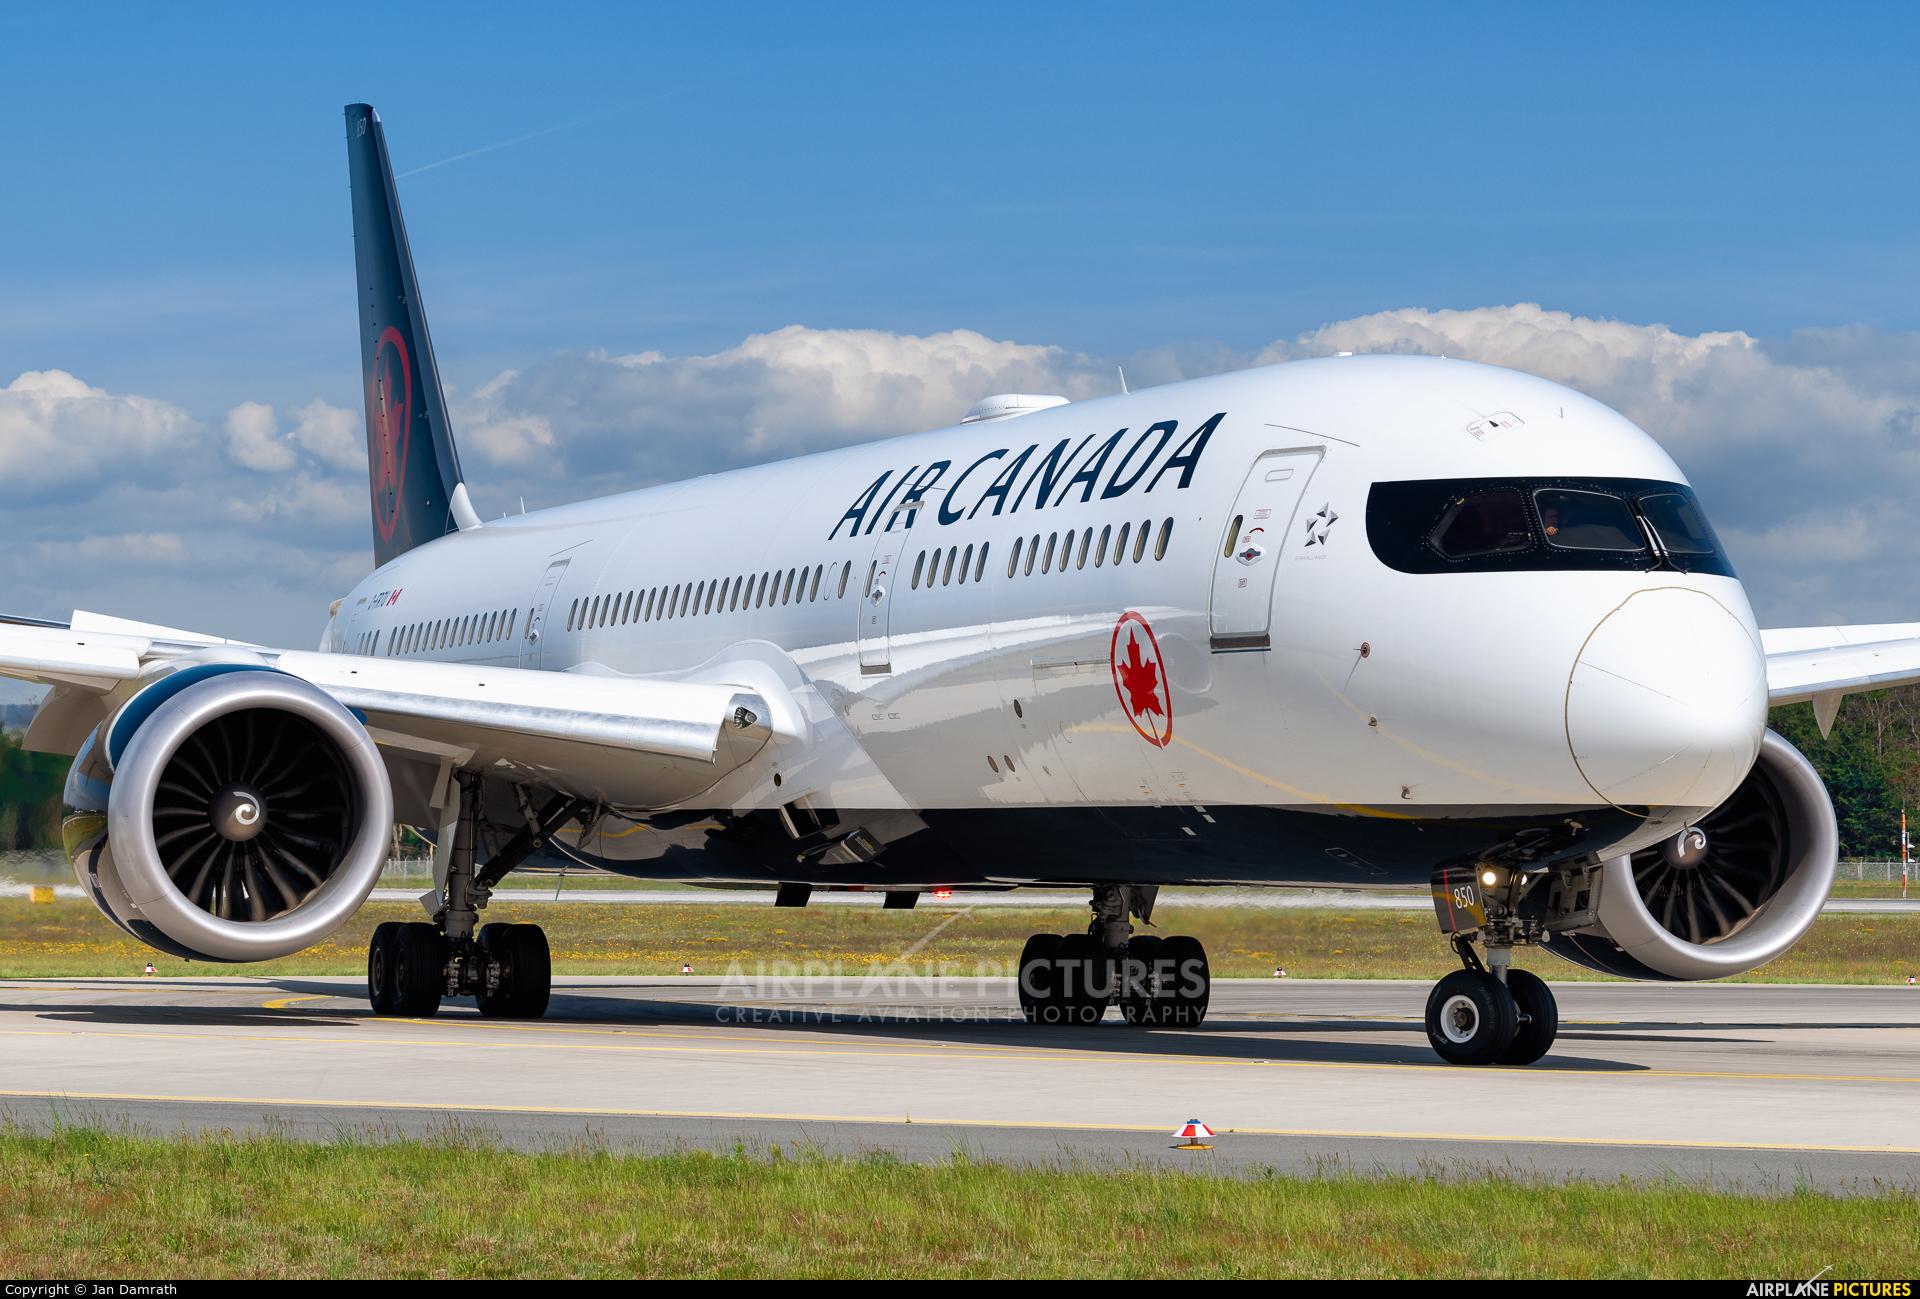 Air Canada C-FRTU aircraft at Frankfurt